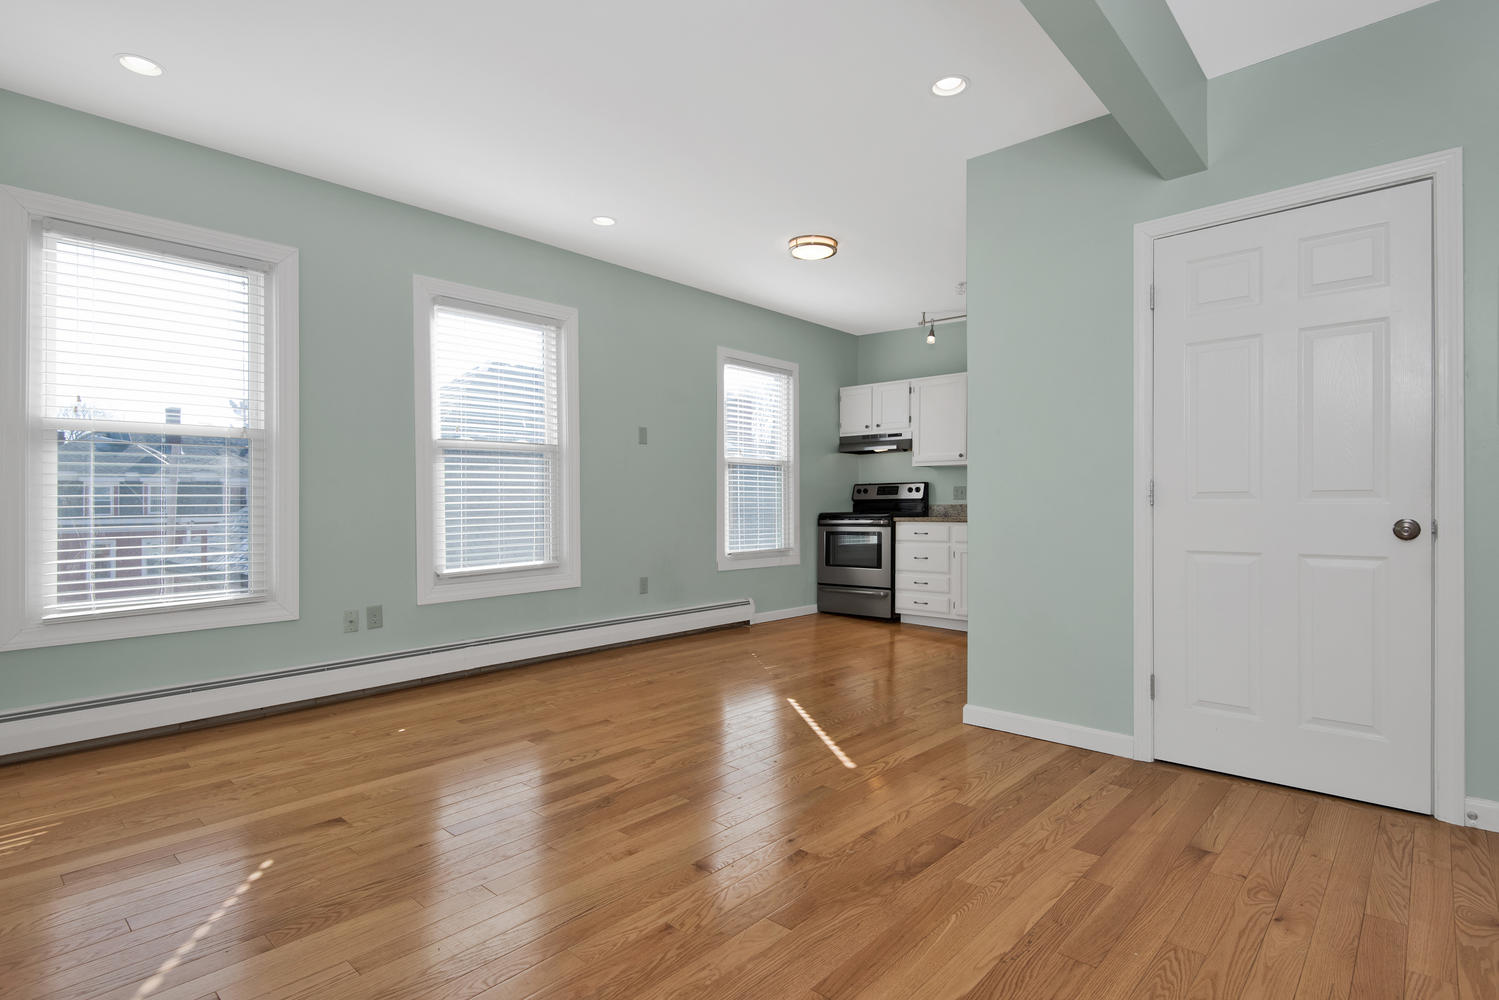 65 Sherman St Unit 12 Portland-large-007-10-Living Room-1499x1000-72dpi.jpg